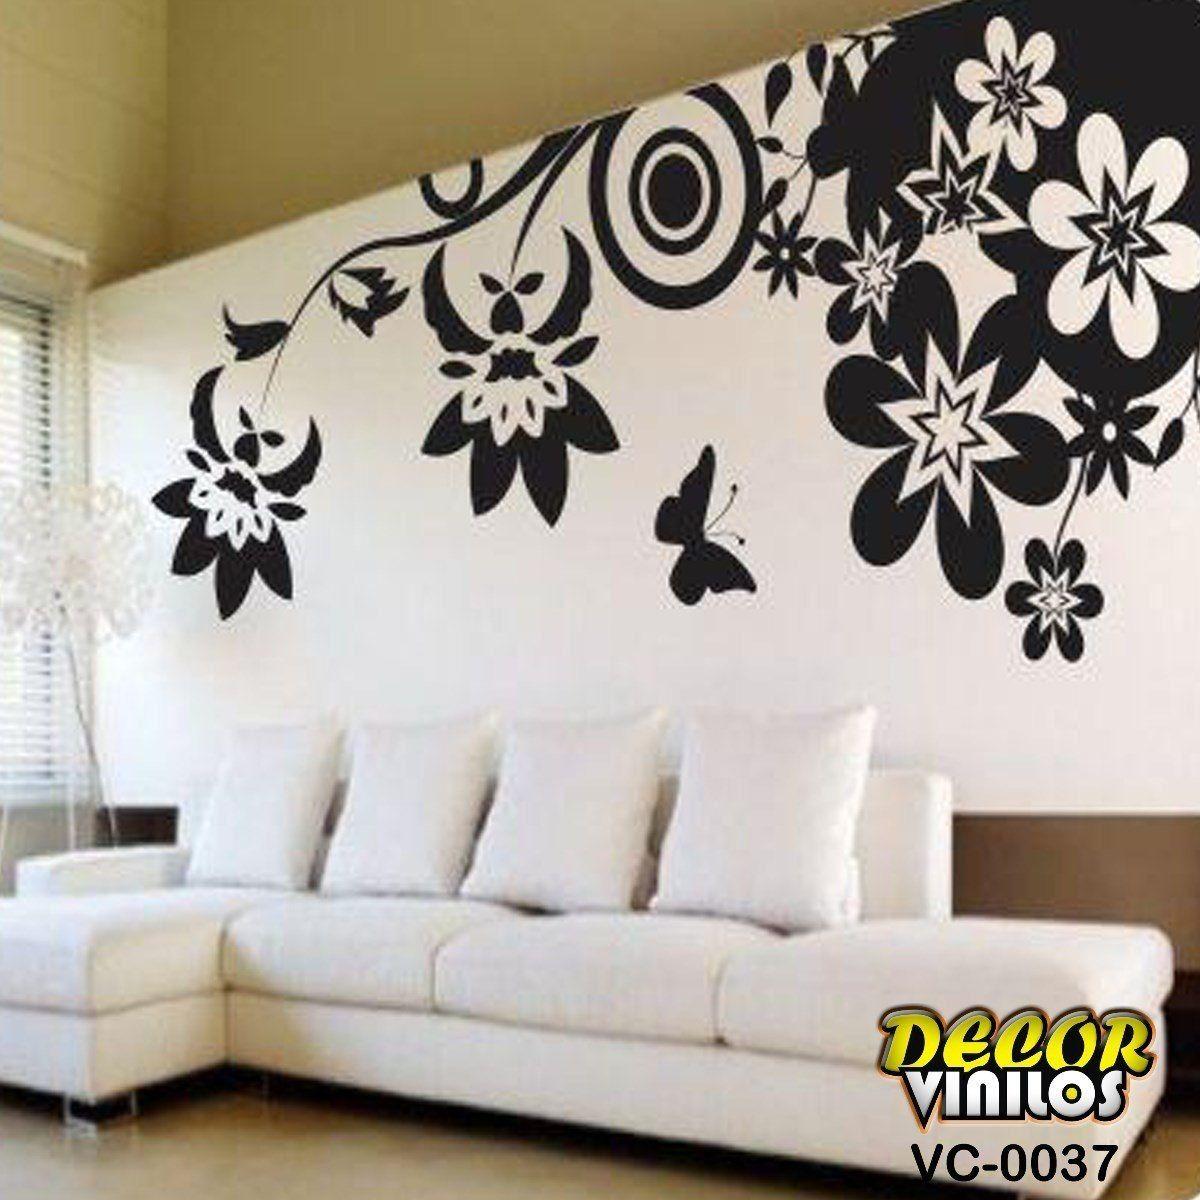 Image result for vinilos decorativos vinilos decorativos for Decorativos pared